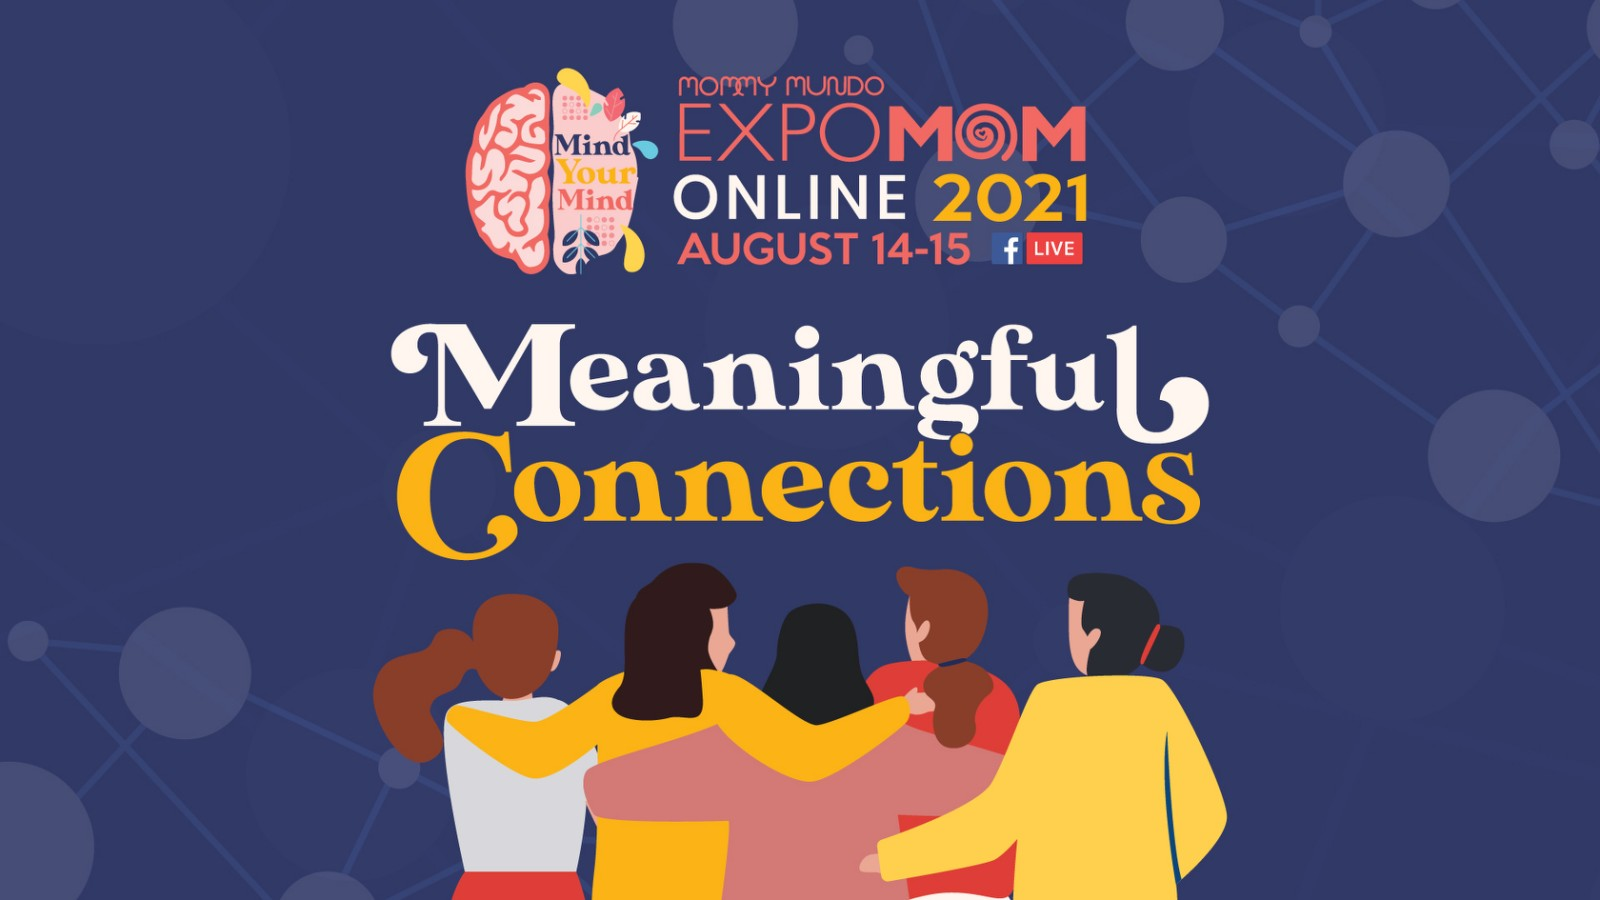 expomom 2020 online